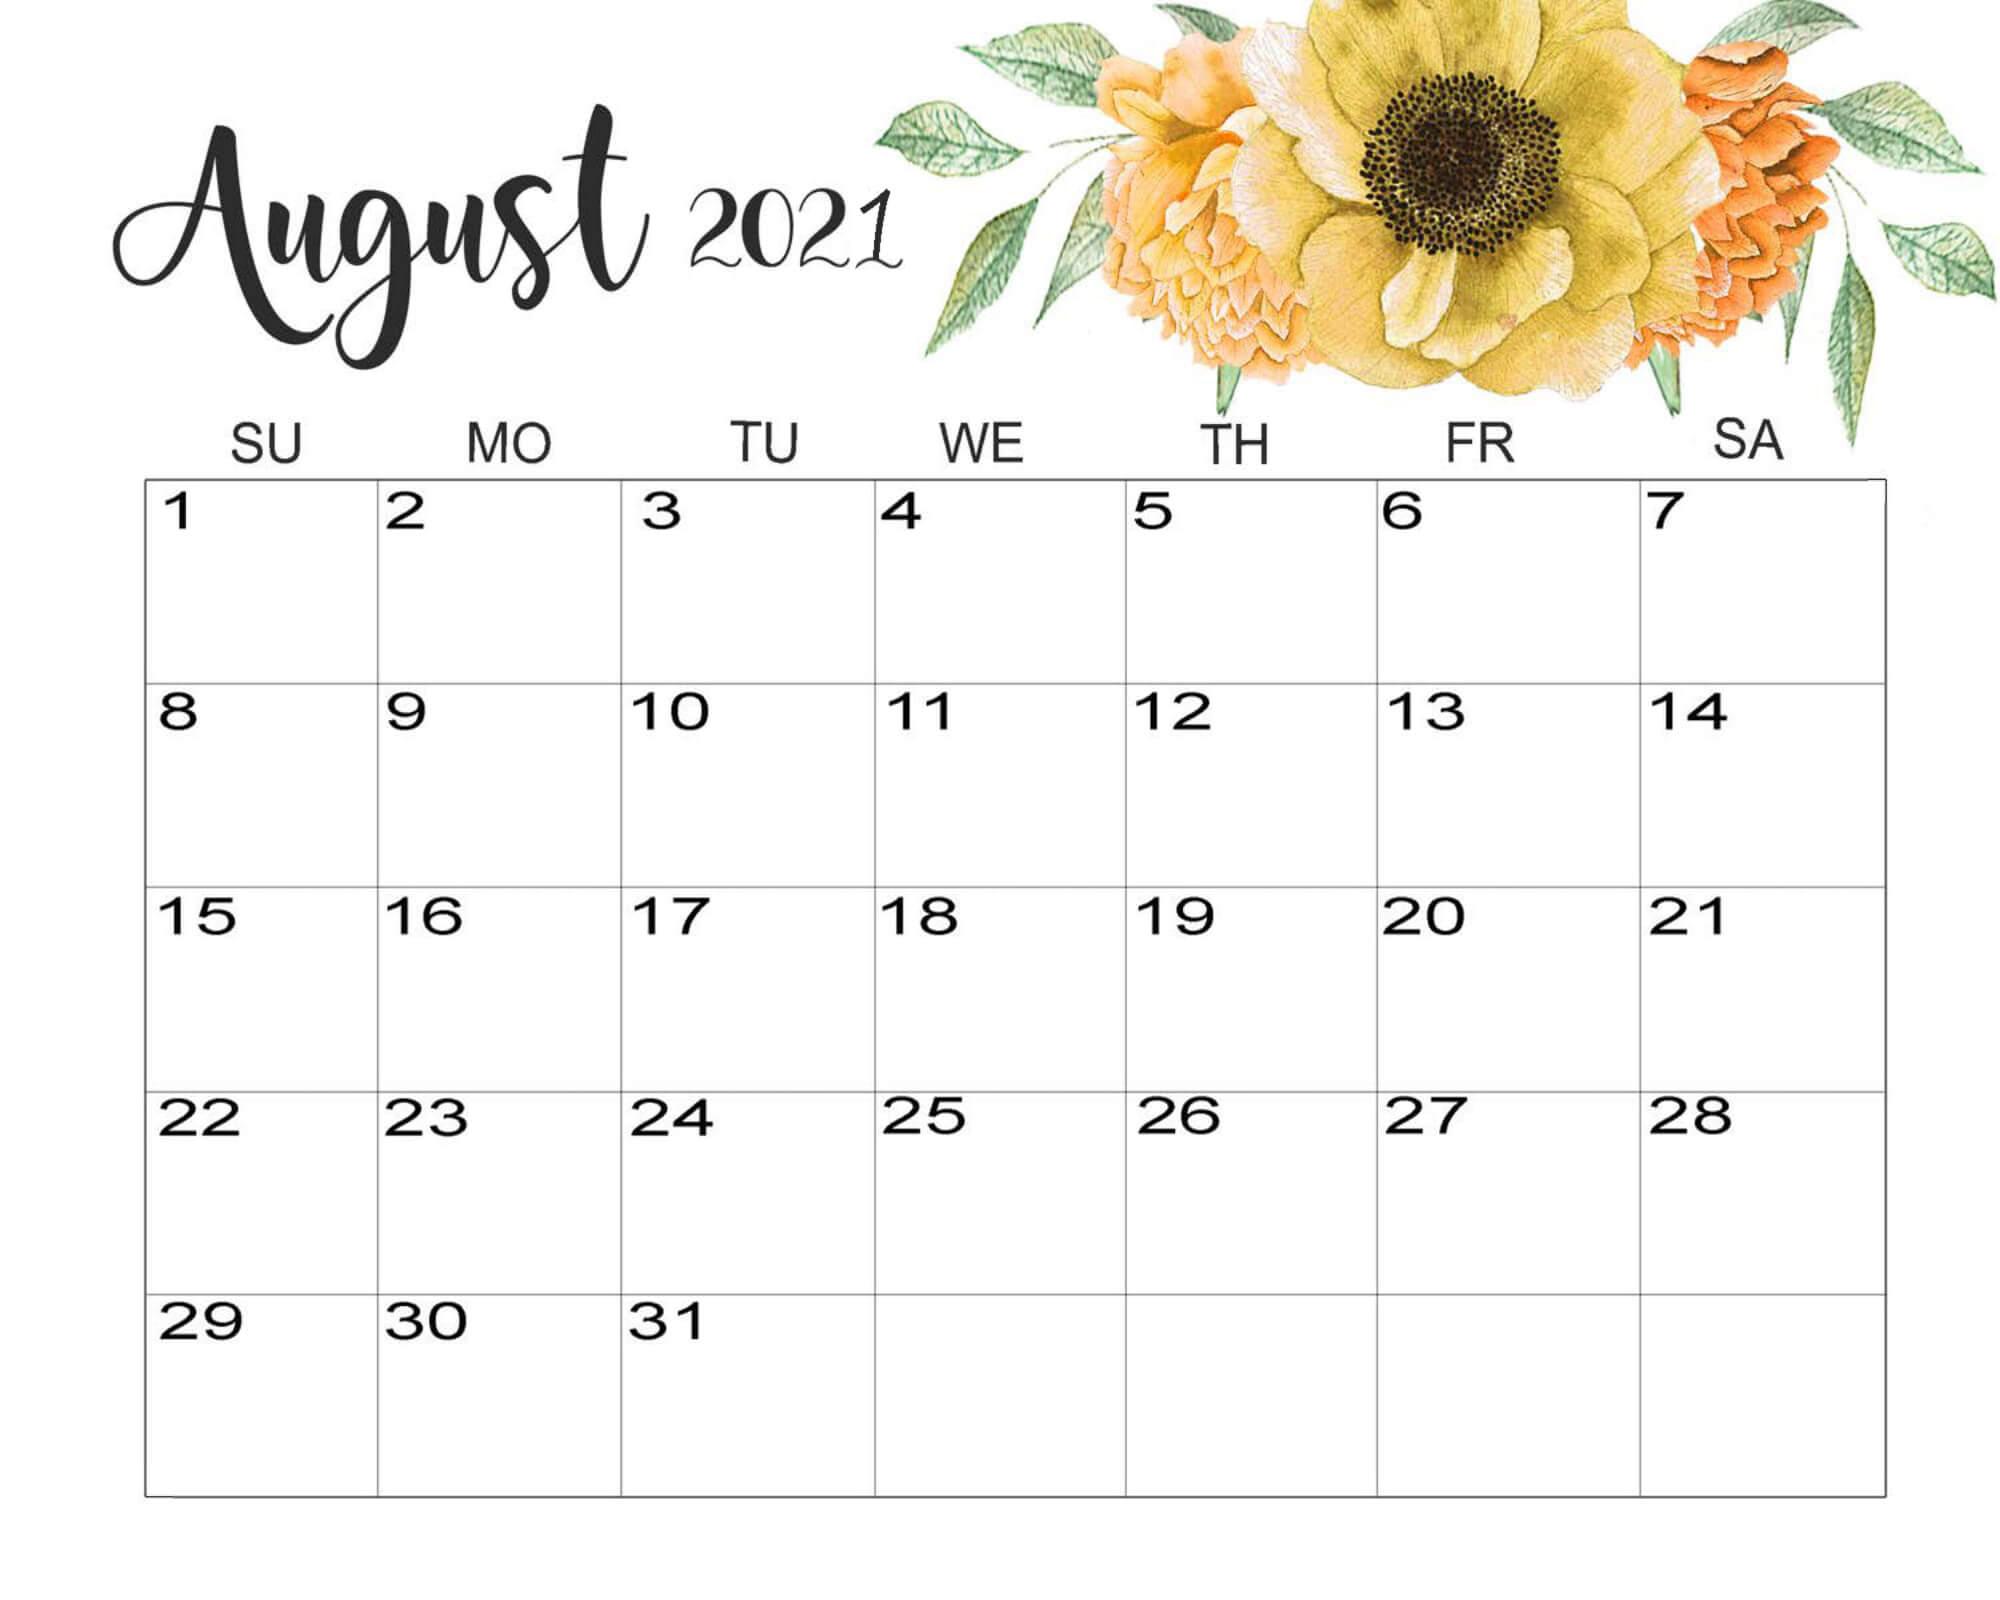 August Calendar 2021 Cute